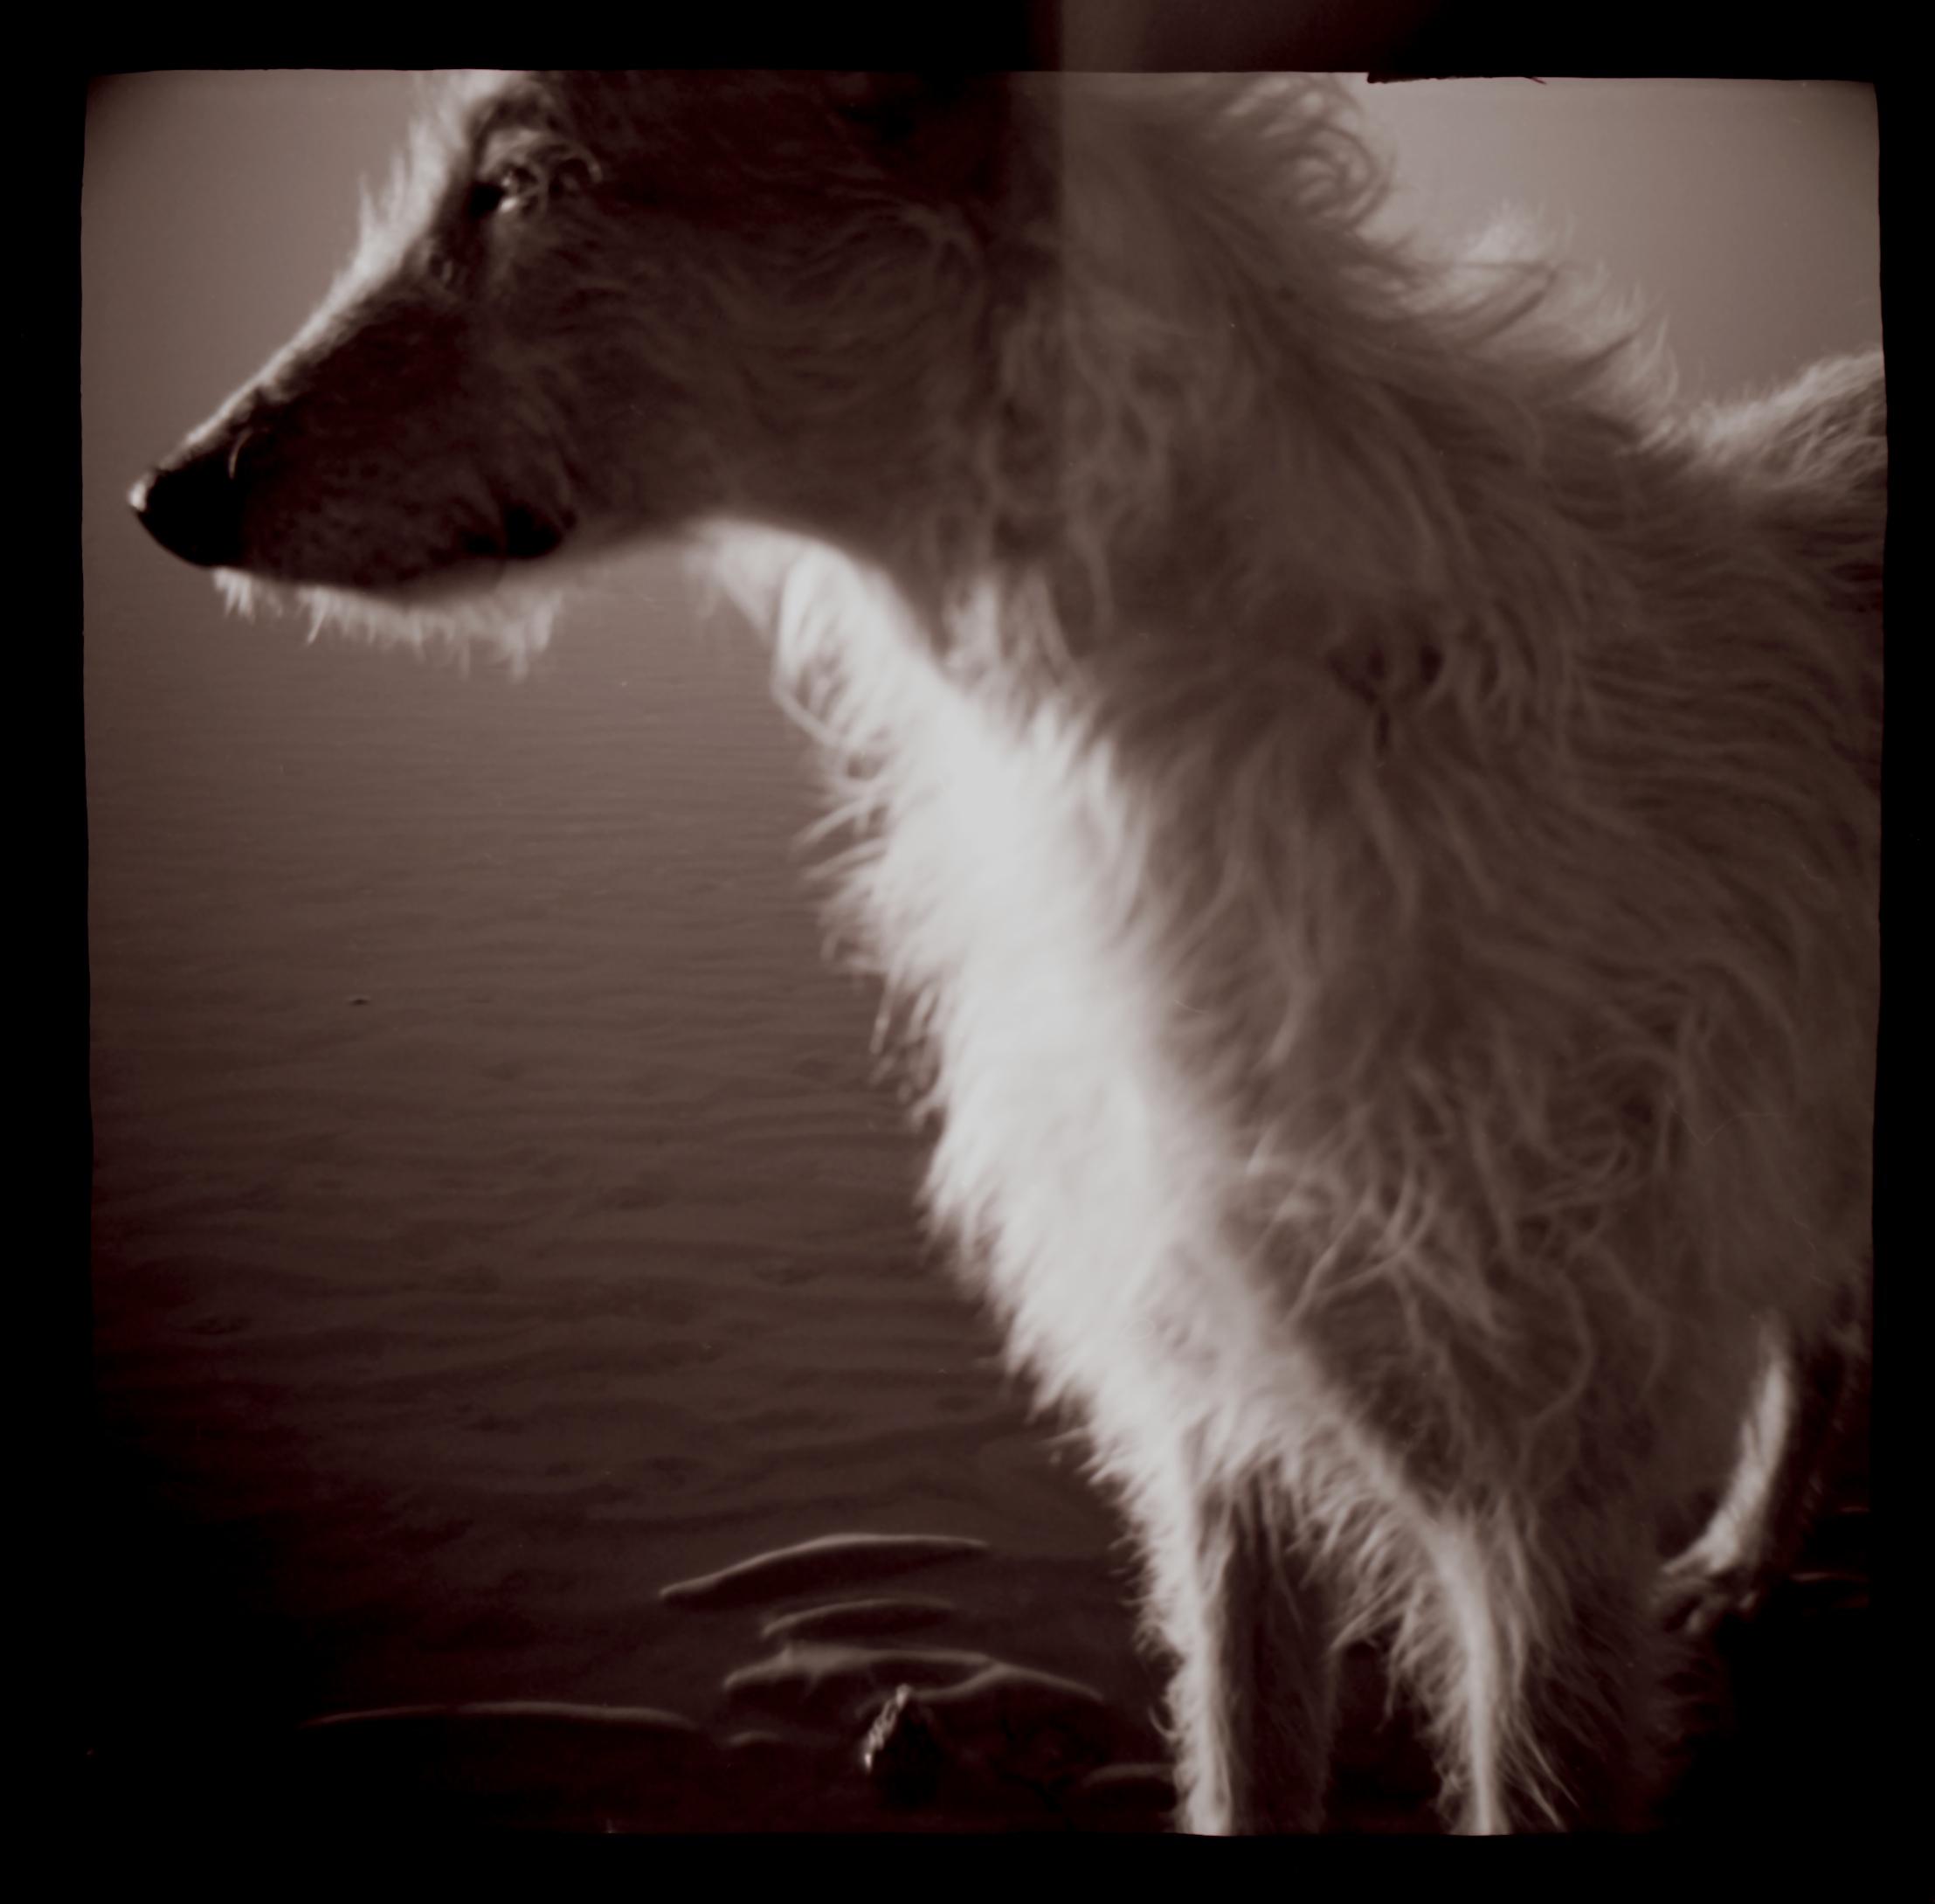 Hugh's dog Minnow